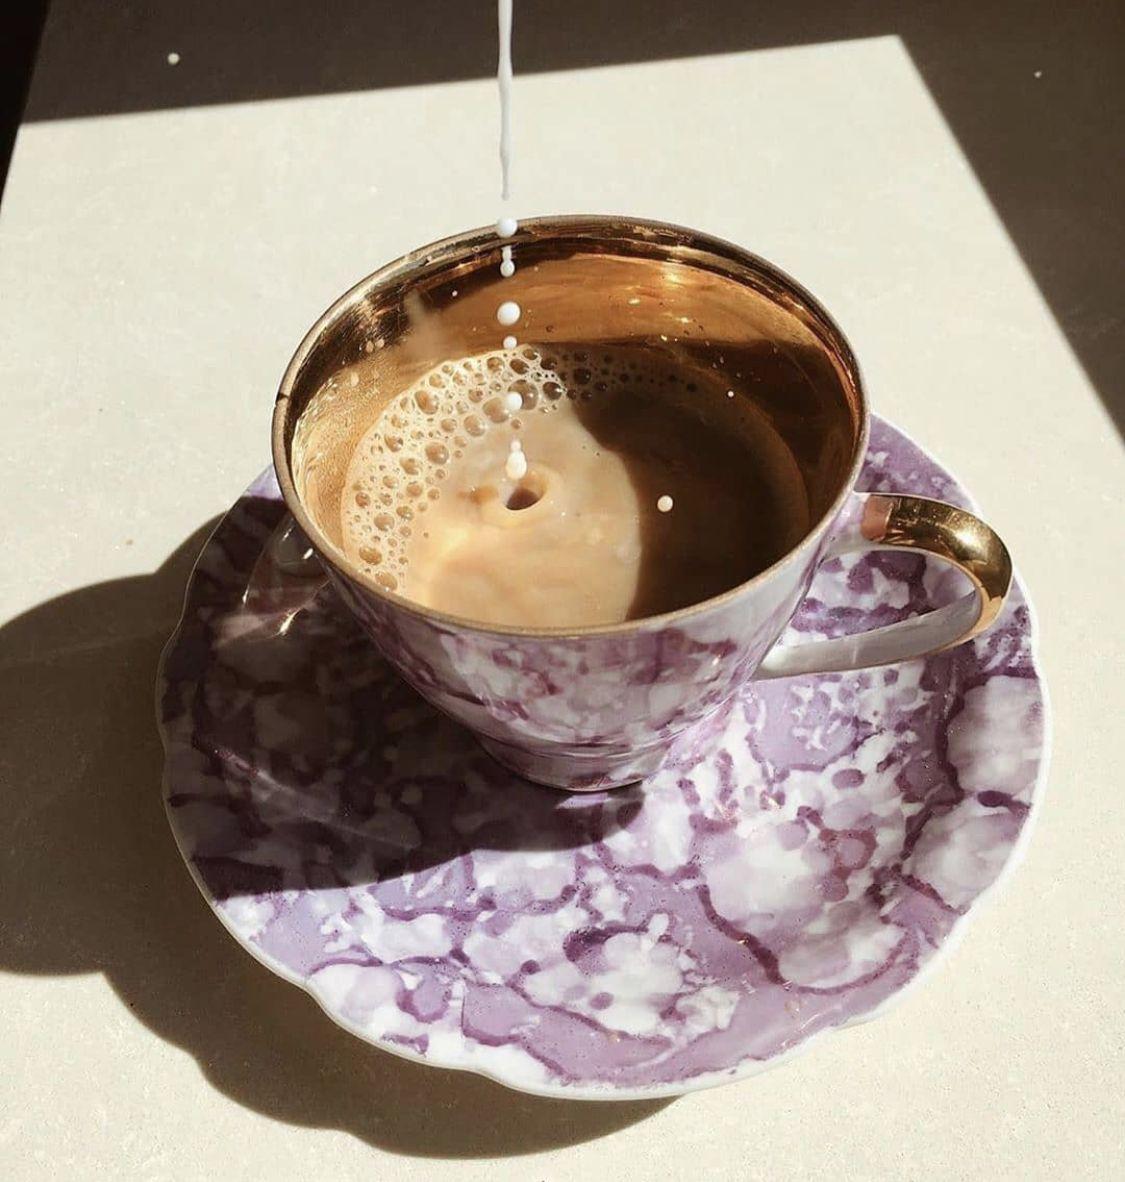 Pin By Koripic On Personality Type Estj Aesthetic Food Aesthetic Coffee Food